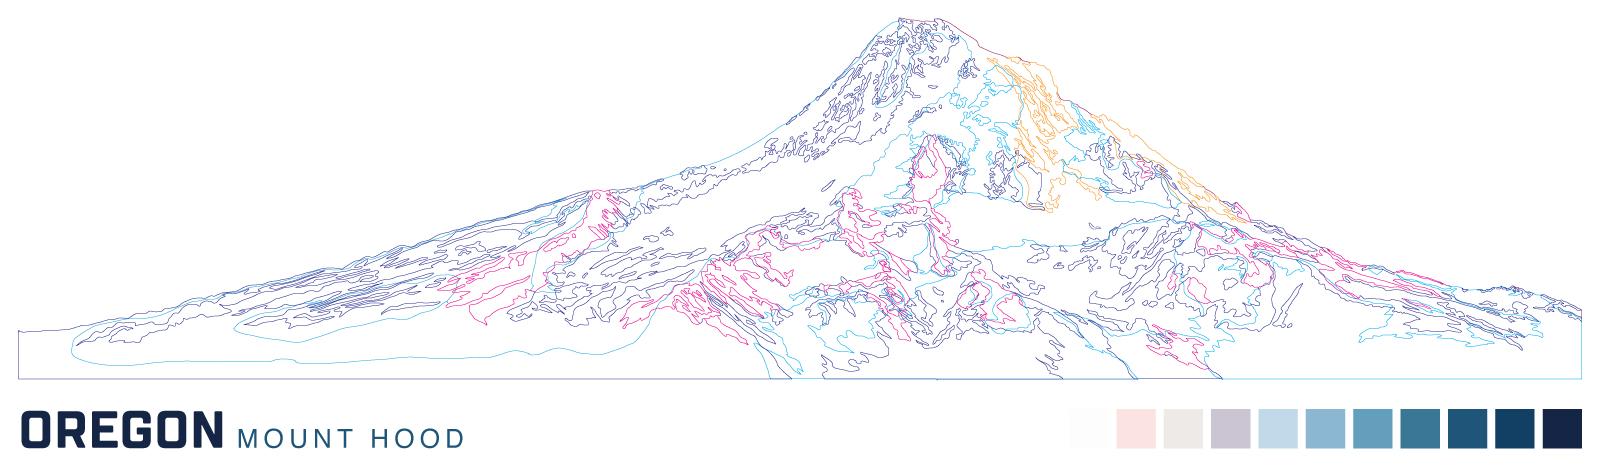 Mount-Hood_Outline.jpg